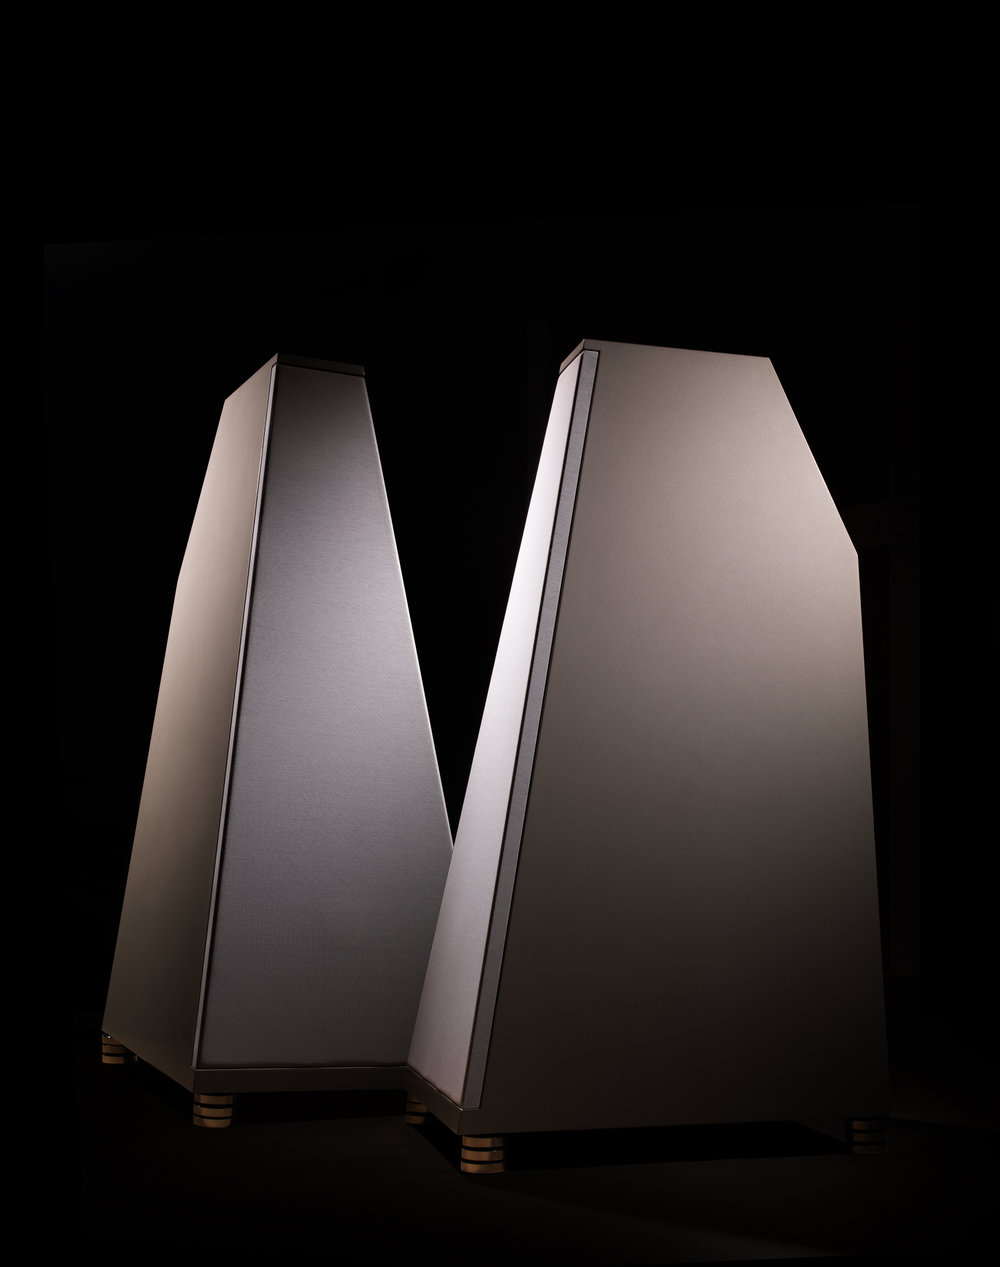 XB3 - Inspiration Line Speakers